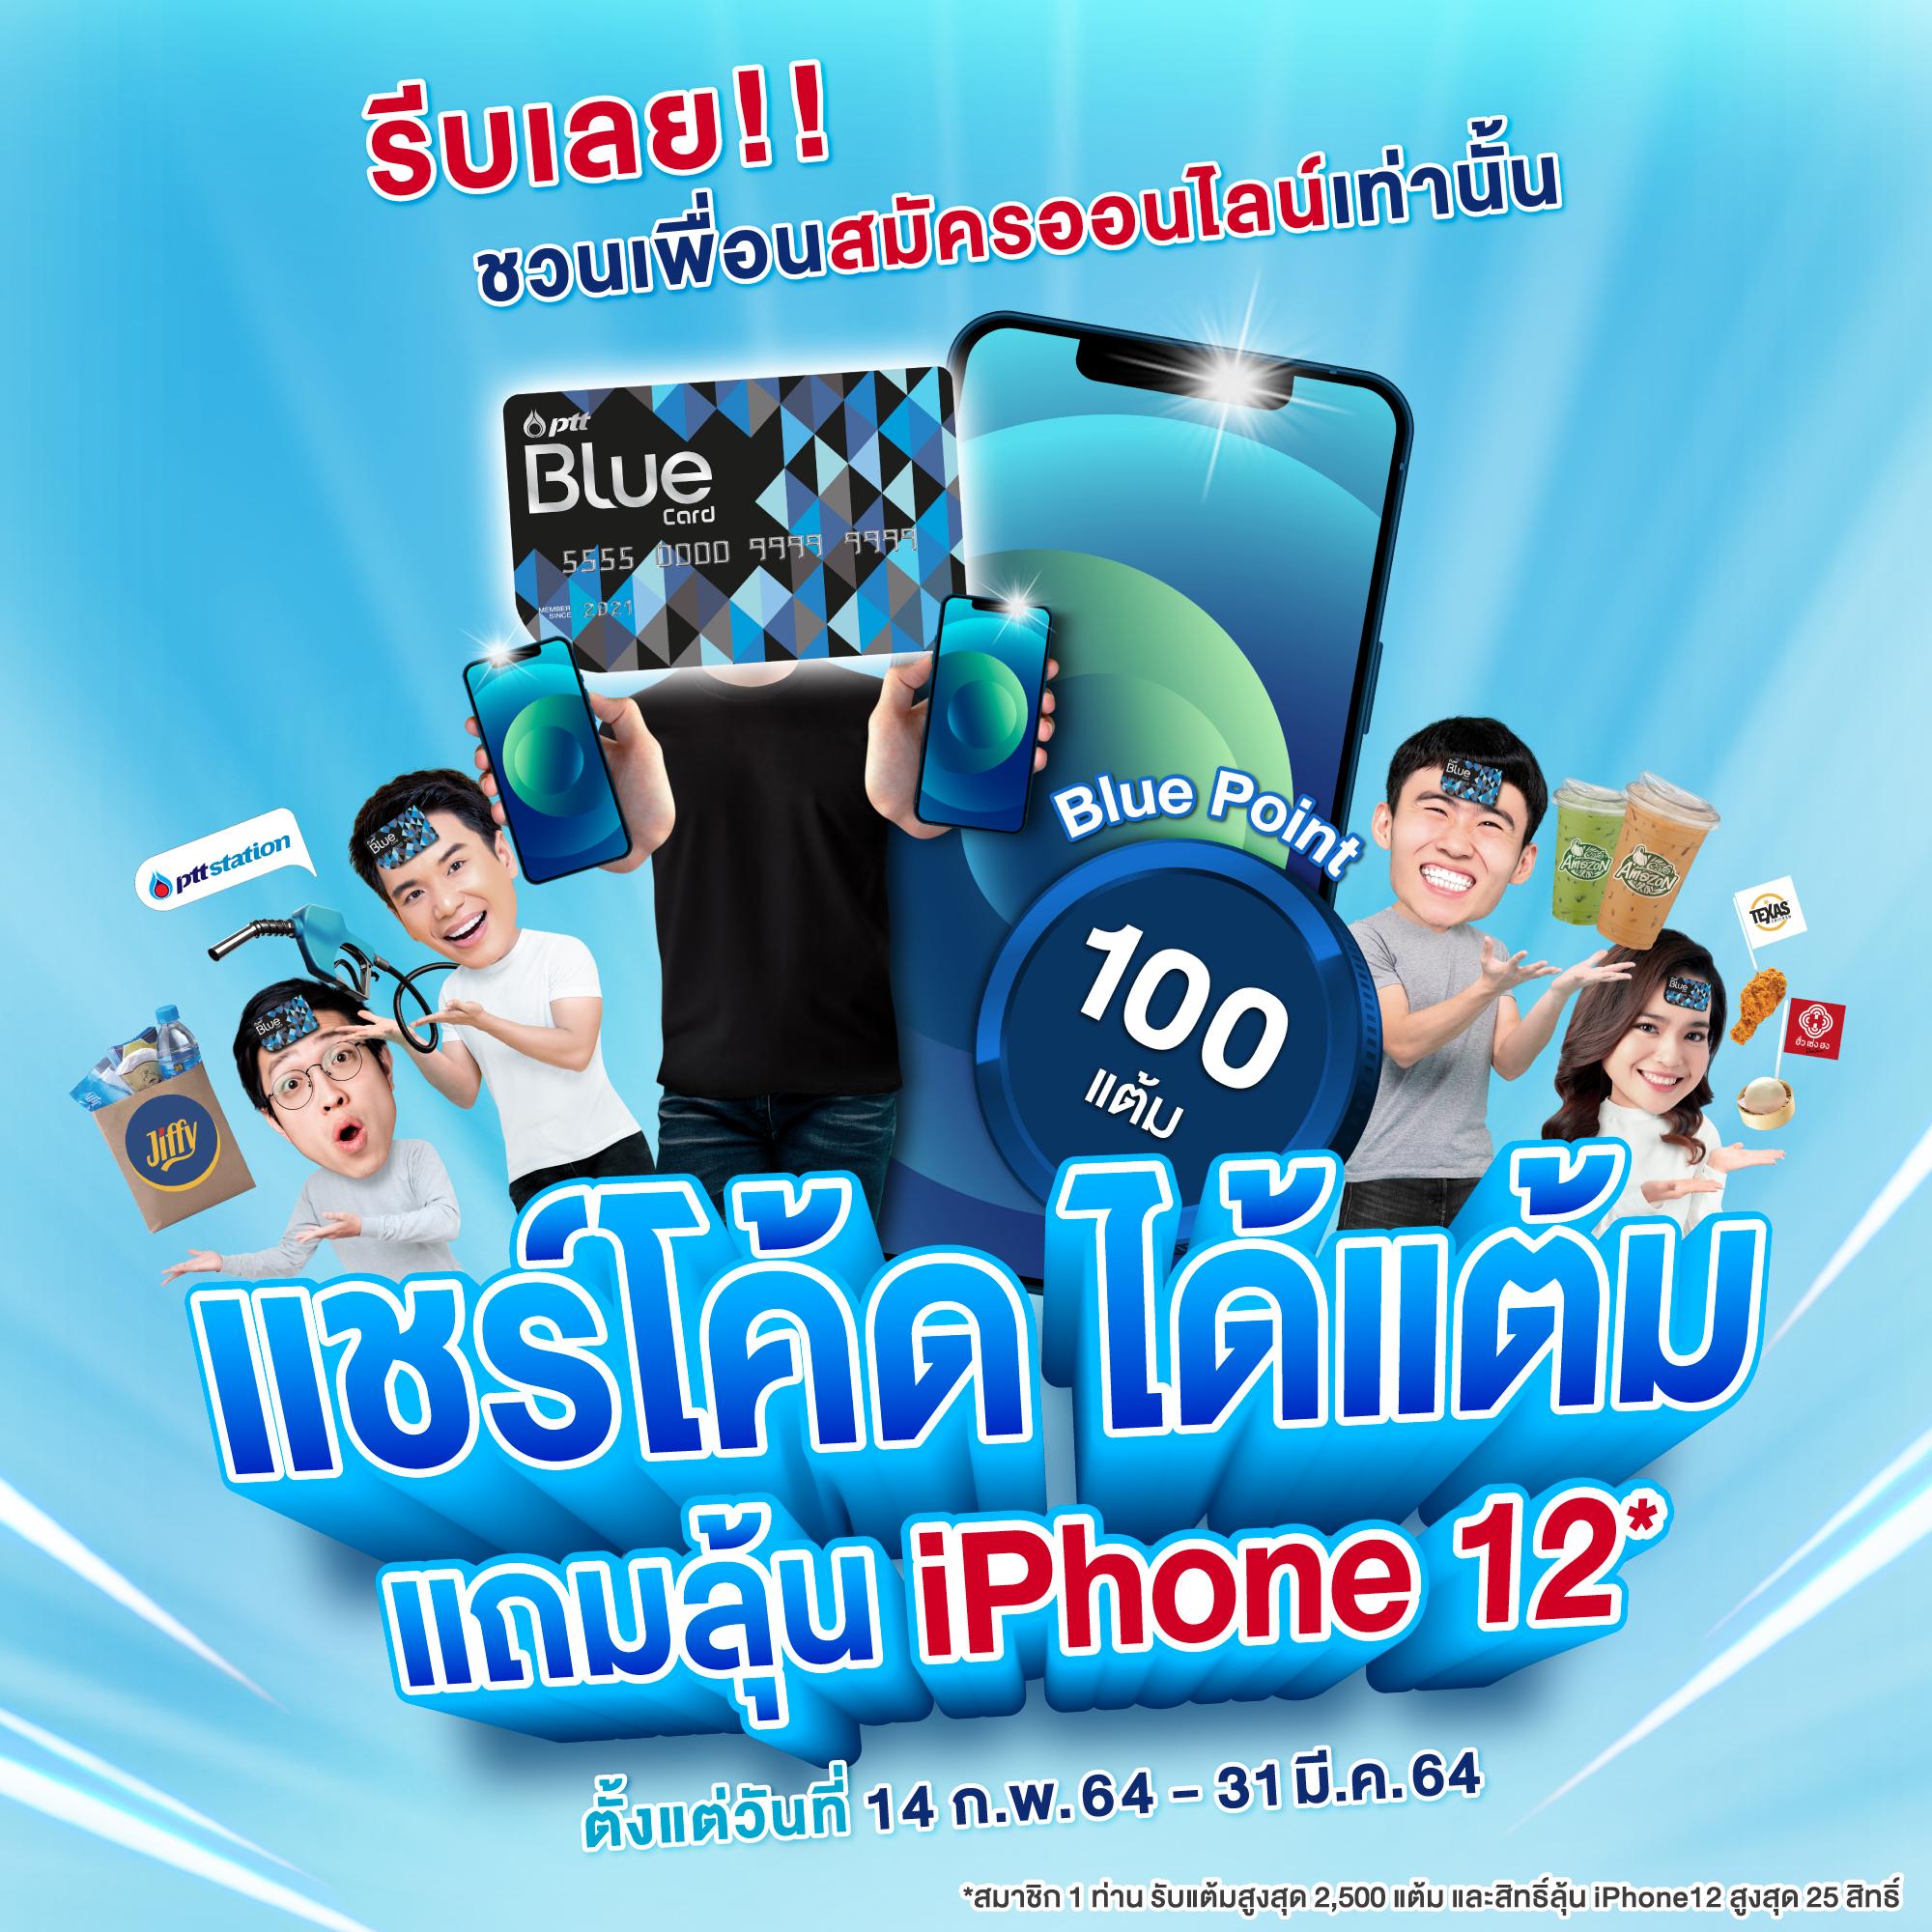 Blue card iPhone 12 PTT ปตท